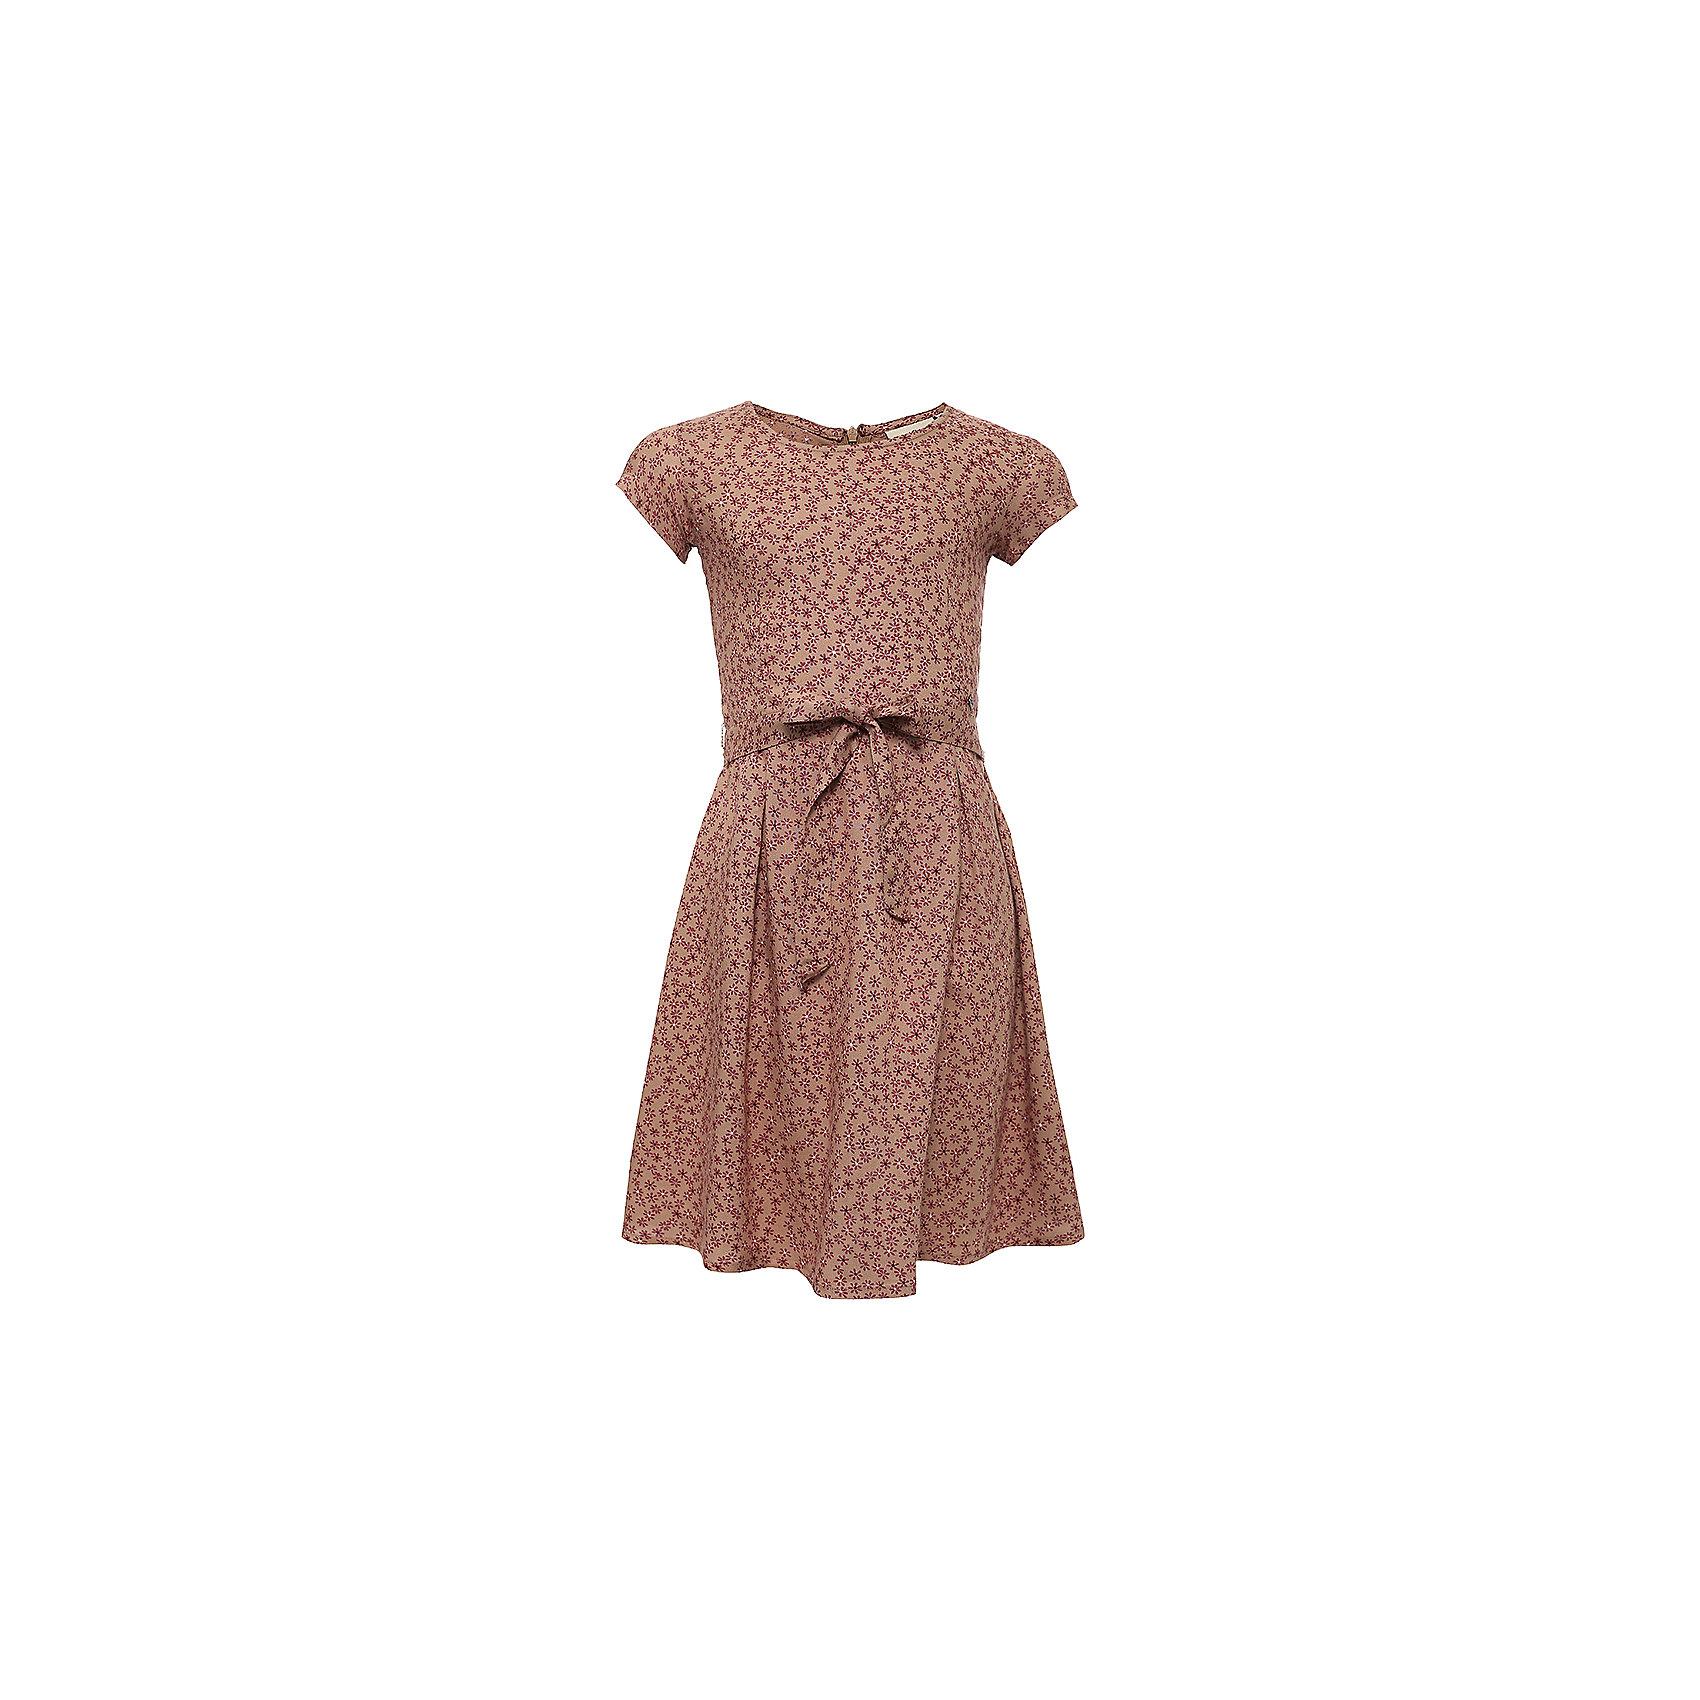 Платье для девочки Finn FlareПлатье для девочки от известного бренда Finn Flare<br>Фактура материала:Текстильный<br>Вид застежки:Молния<br> Длина рукава:Короткие<br> Тип карманов:Без карманов<br>Состав:<br>100% вискоза<br><br>Ширина мм: 236<br>Глубина мм: 16<br>Высота мм: 184<br>Вес г: 177<br>Цвет: коричневый<br>Возраст от месяцев: 48<br>Возраст до месяцев: 60<br>Пол: Женский<br>Возраст: Детский<br>Размер: 110,122<br>SKU: 4835235